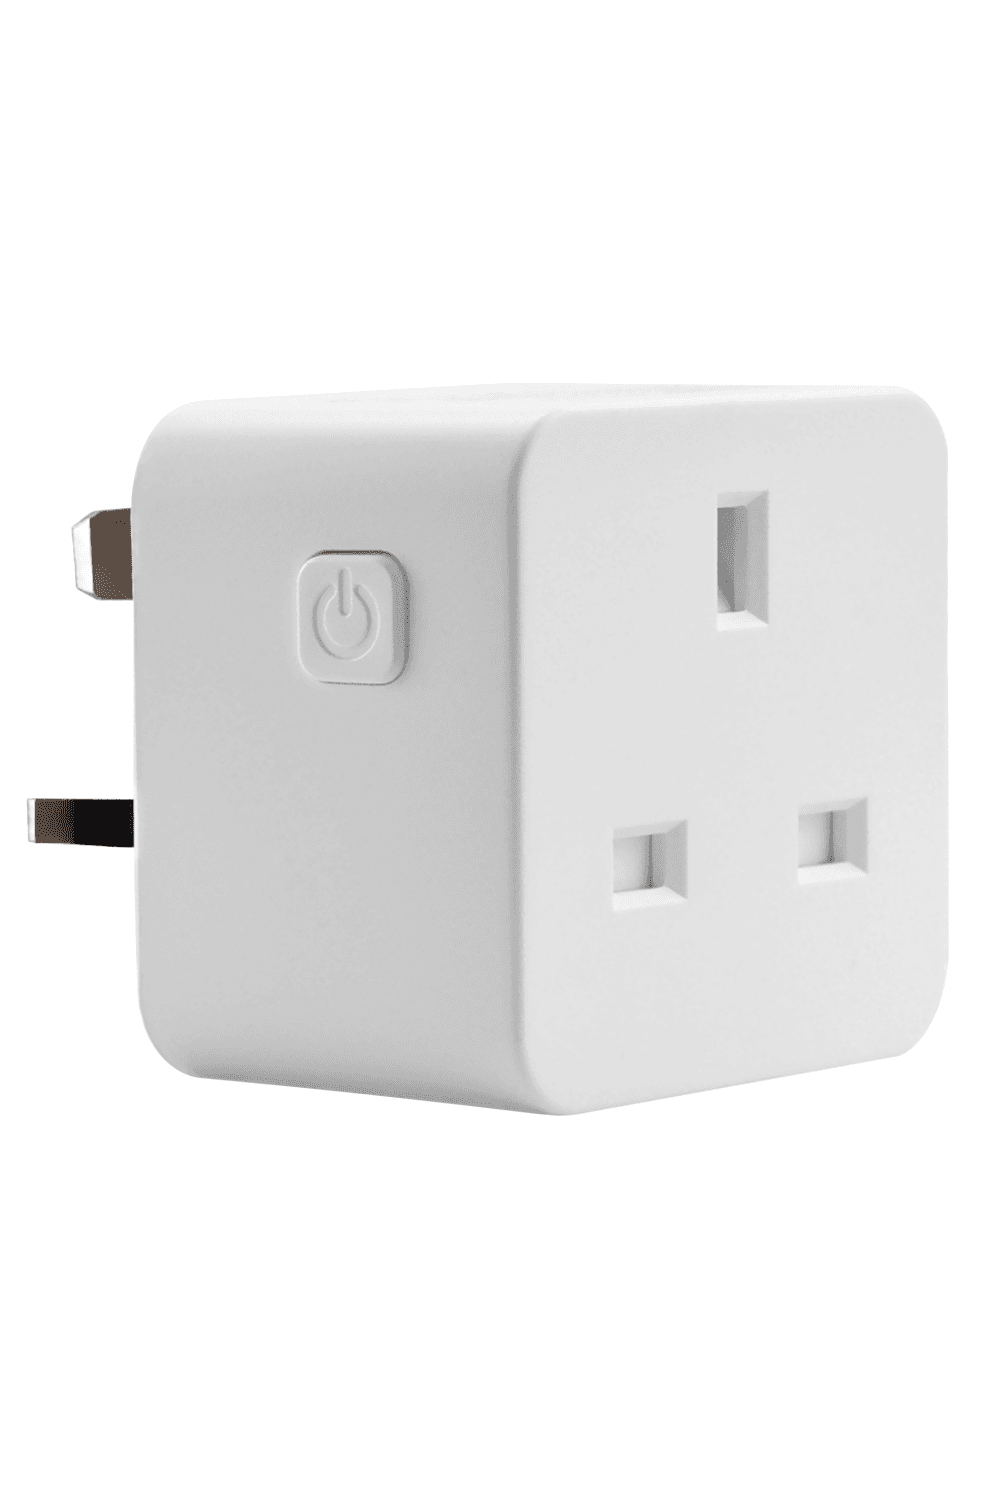 Works with Alexa Woox Smart Plug